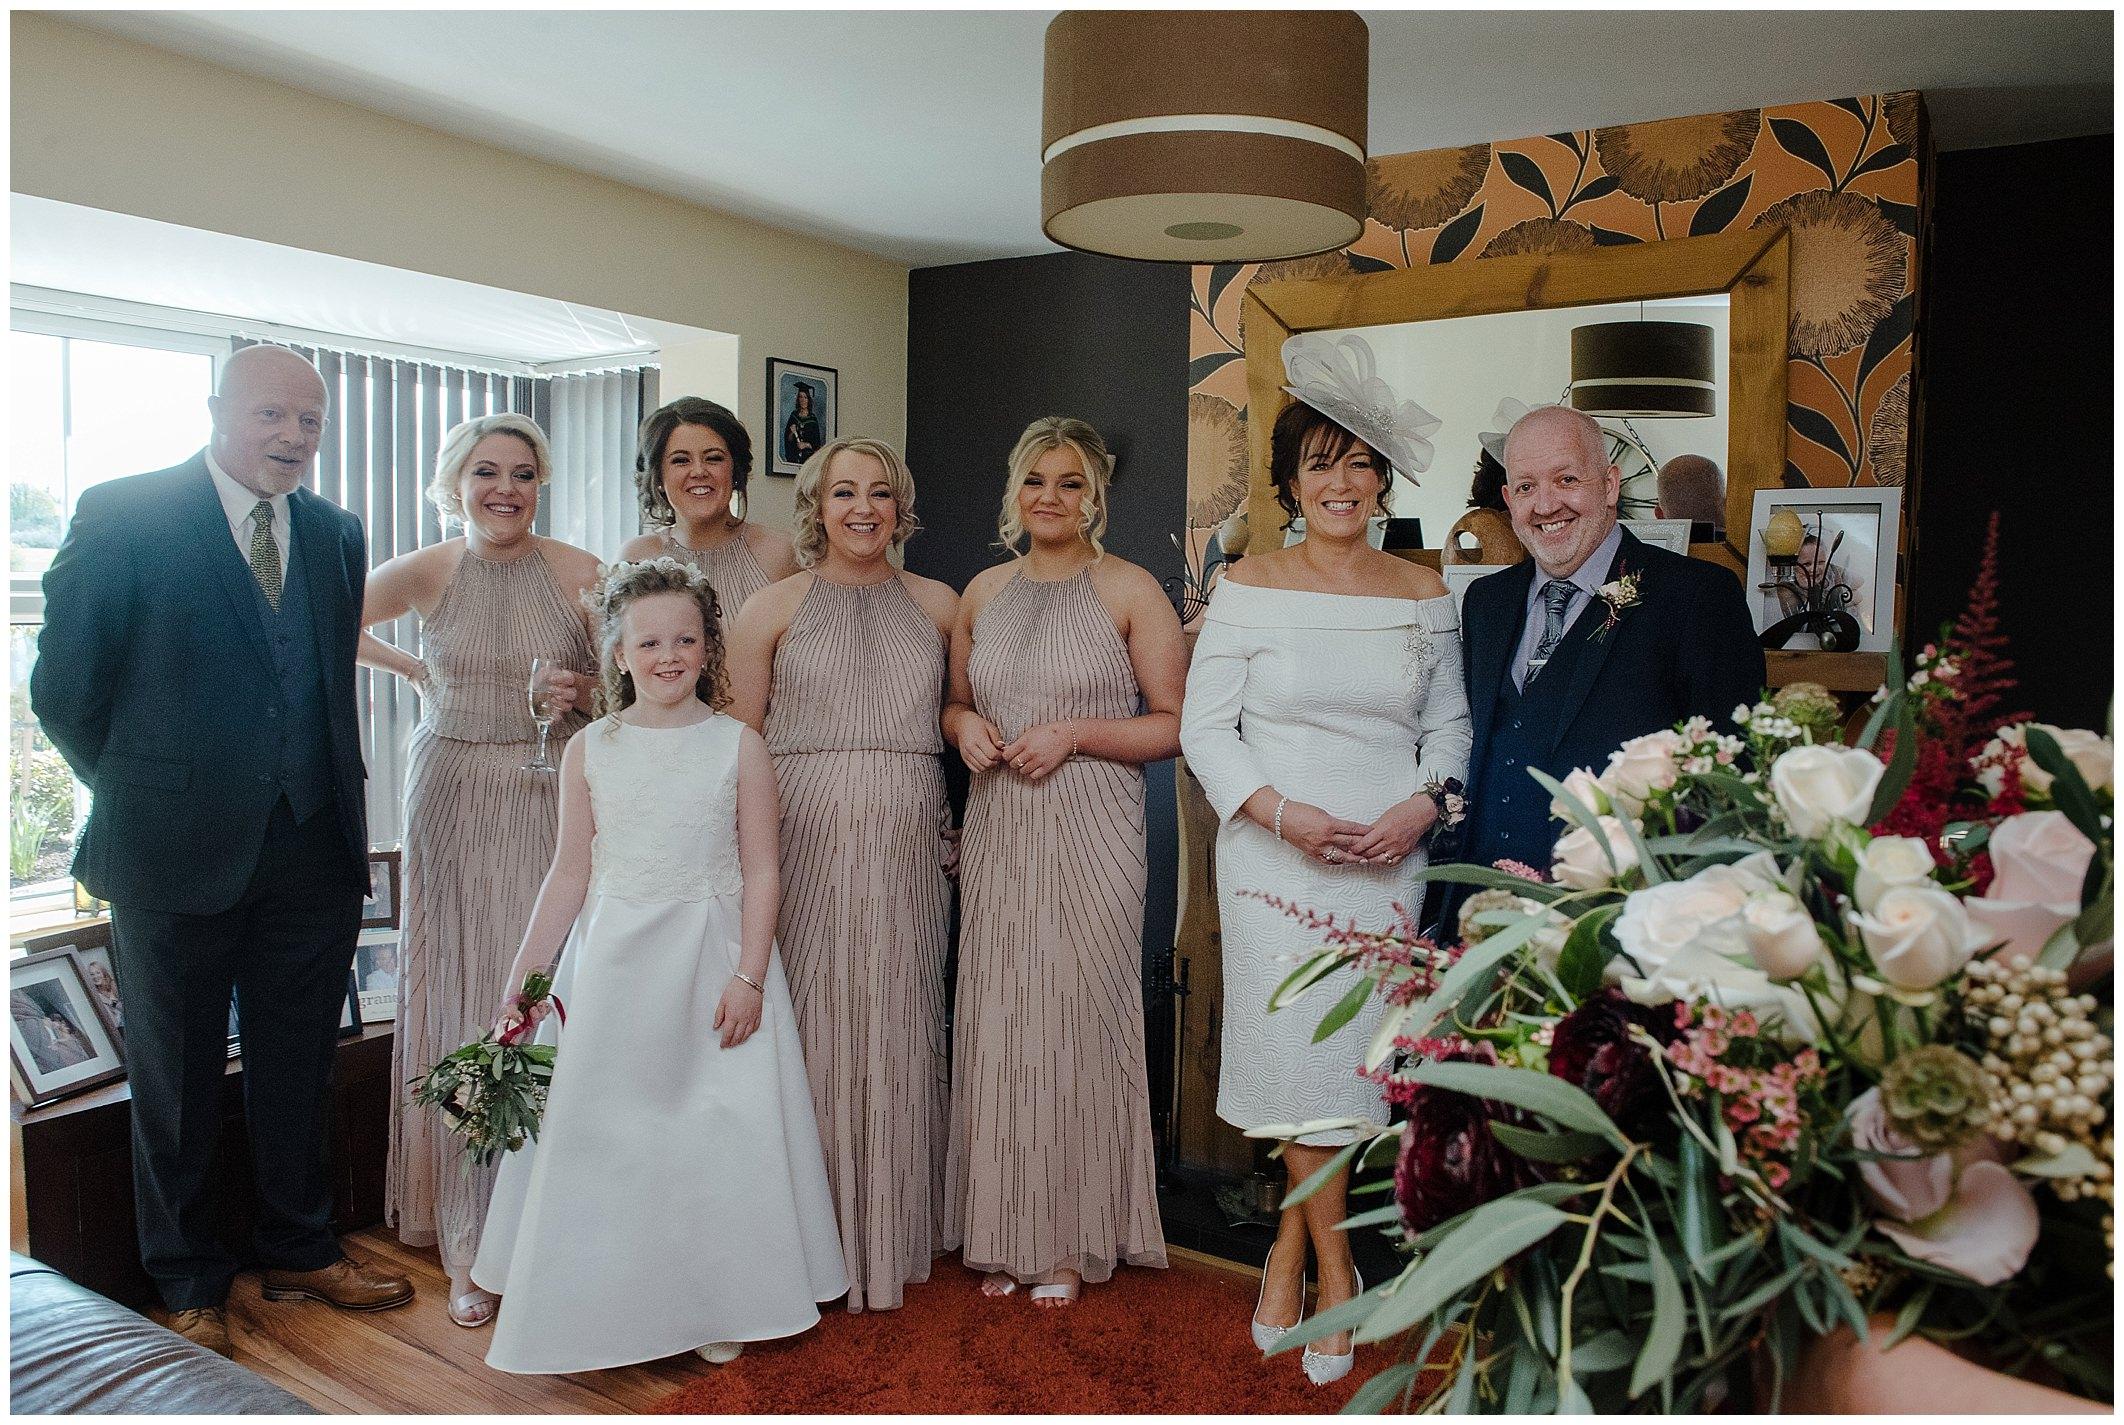 corick-house-wedding-hannah-gary-jude-browne-photography_0018.jpg